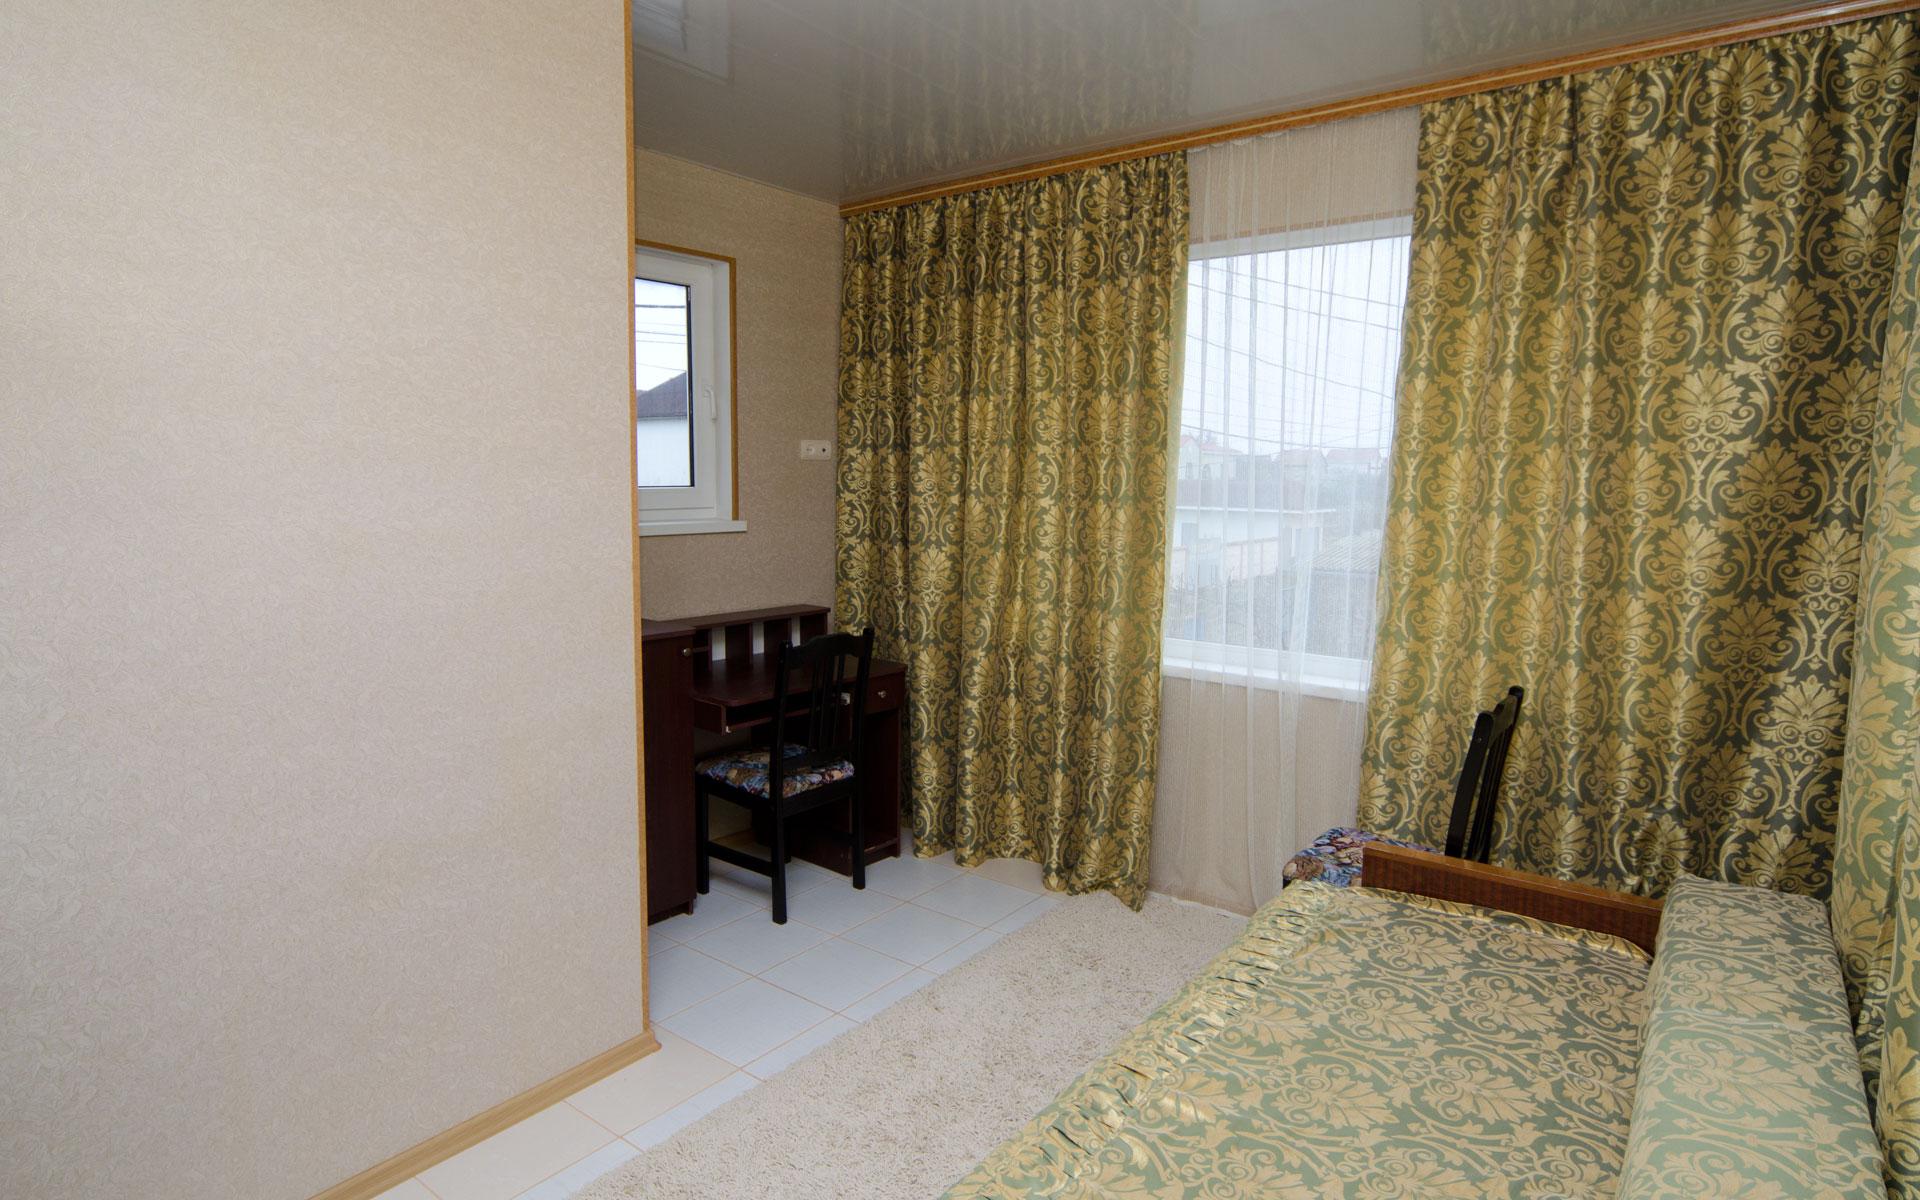 Комната на втором этаже